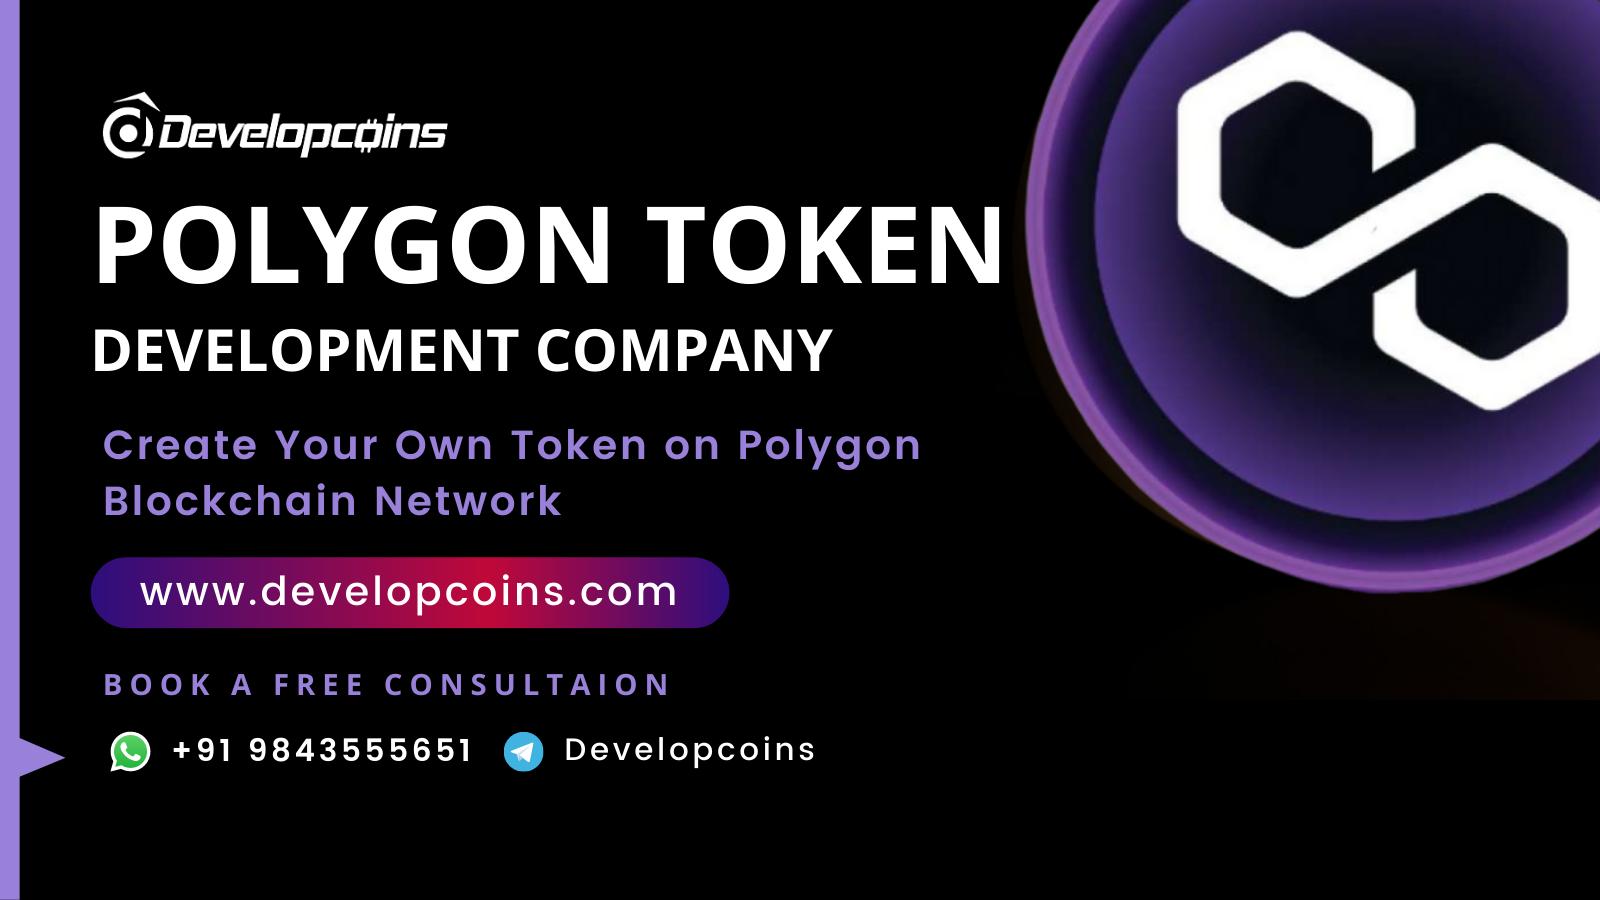 Polygon Token Development Company